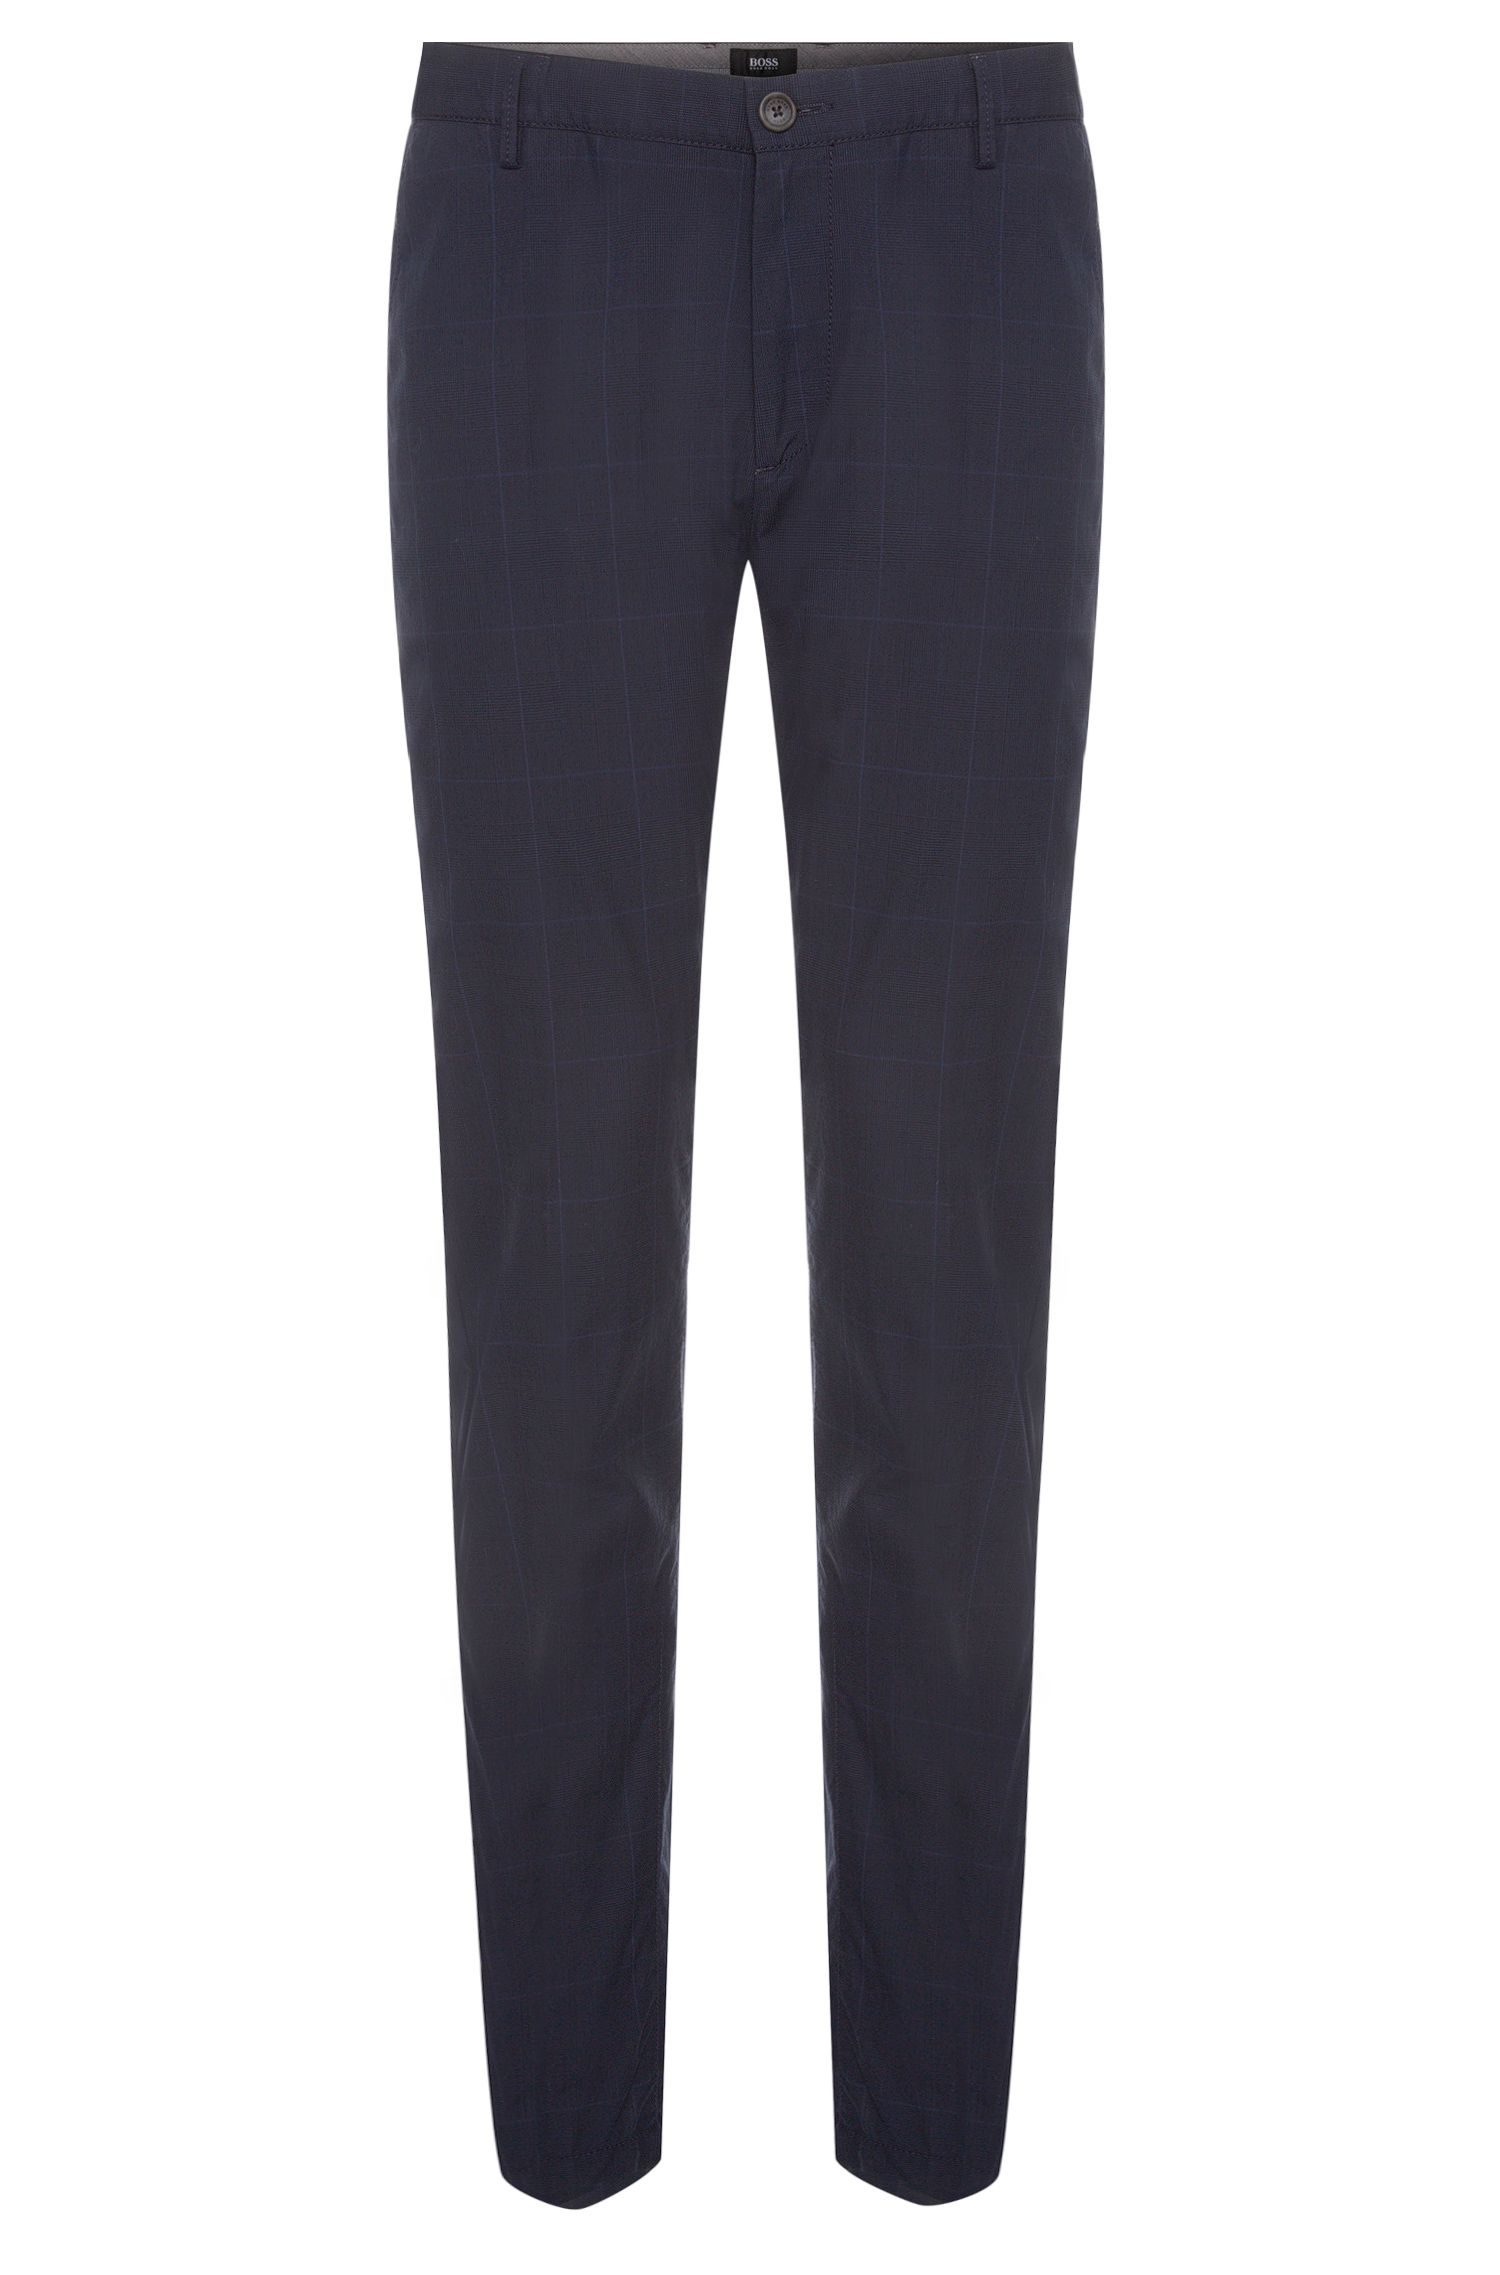 'Rice-W' | Slim Fit, Cotton Pants